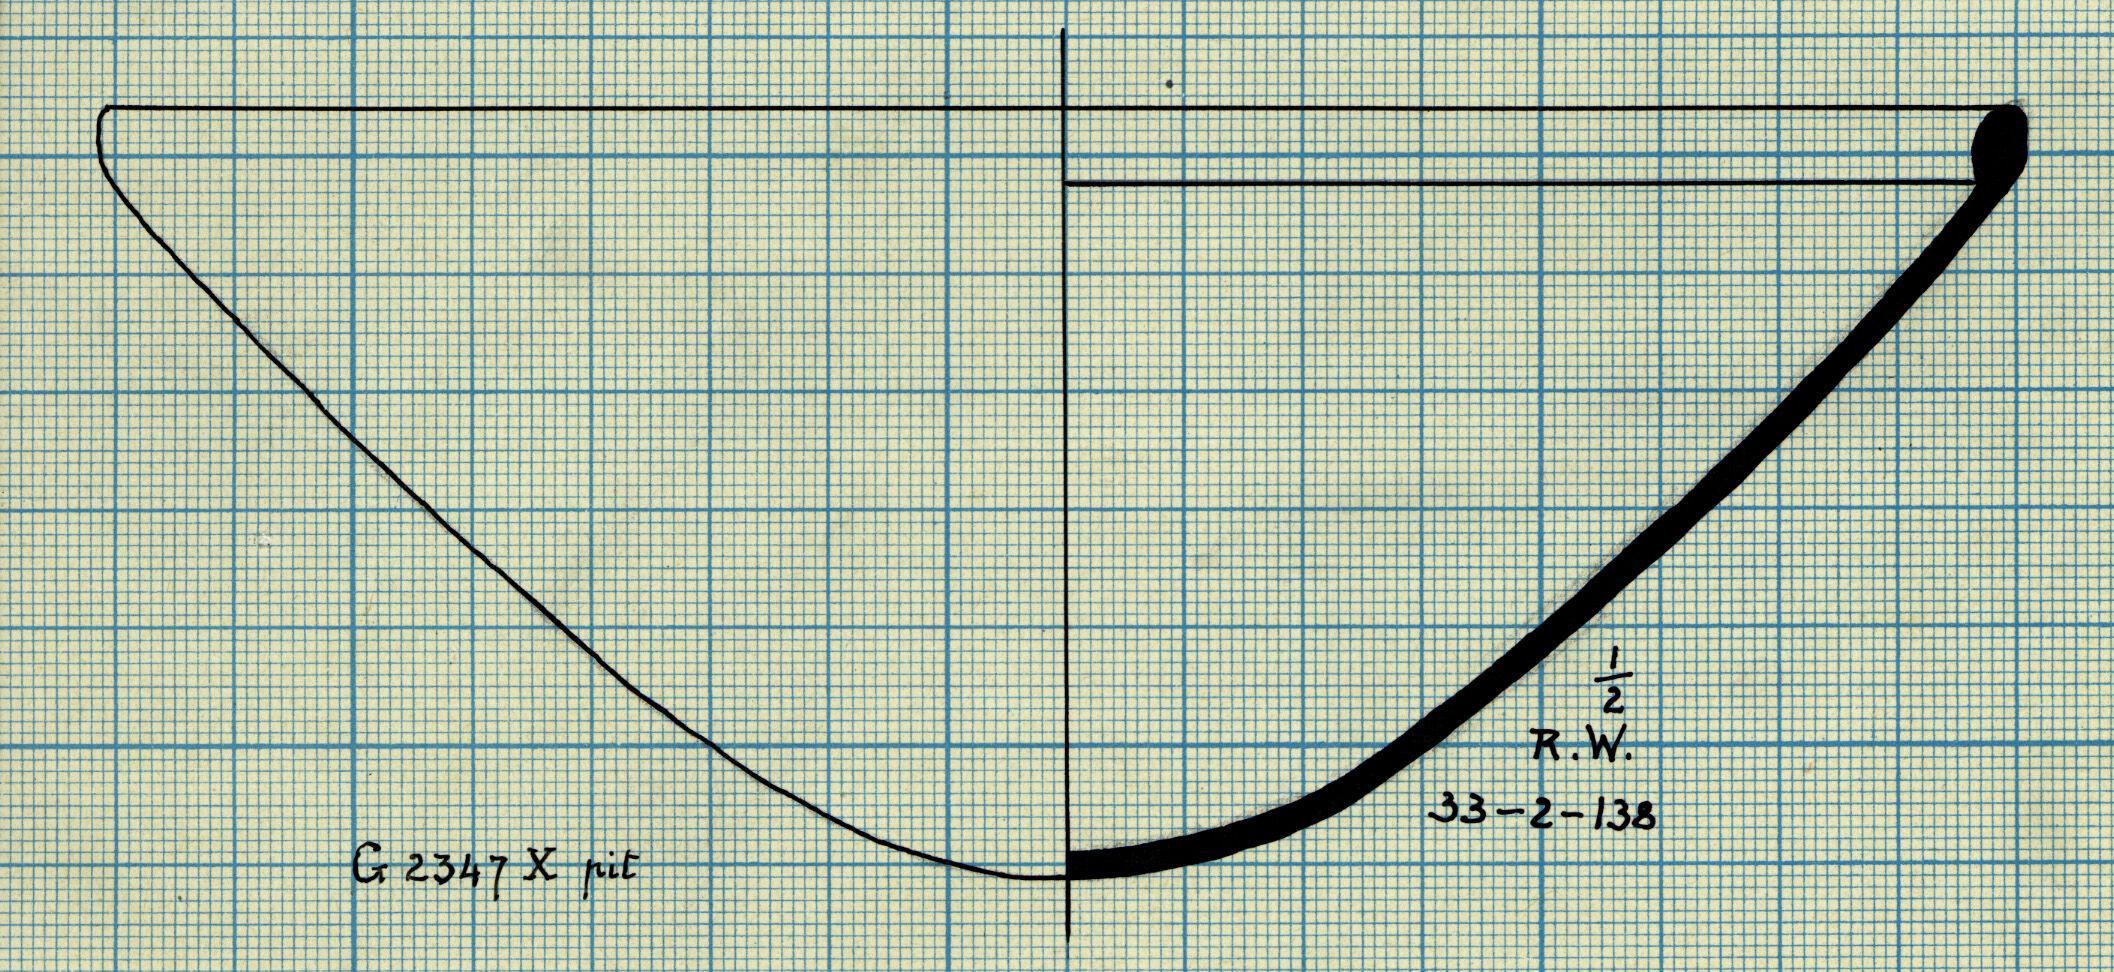 Drawings: G 2347, Shaft X (= G 5562, Shaft A): pottery, bowl